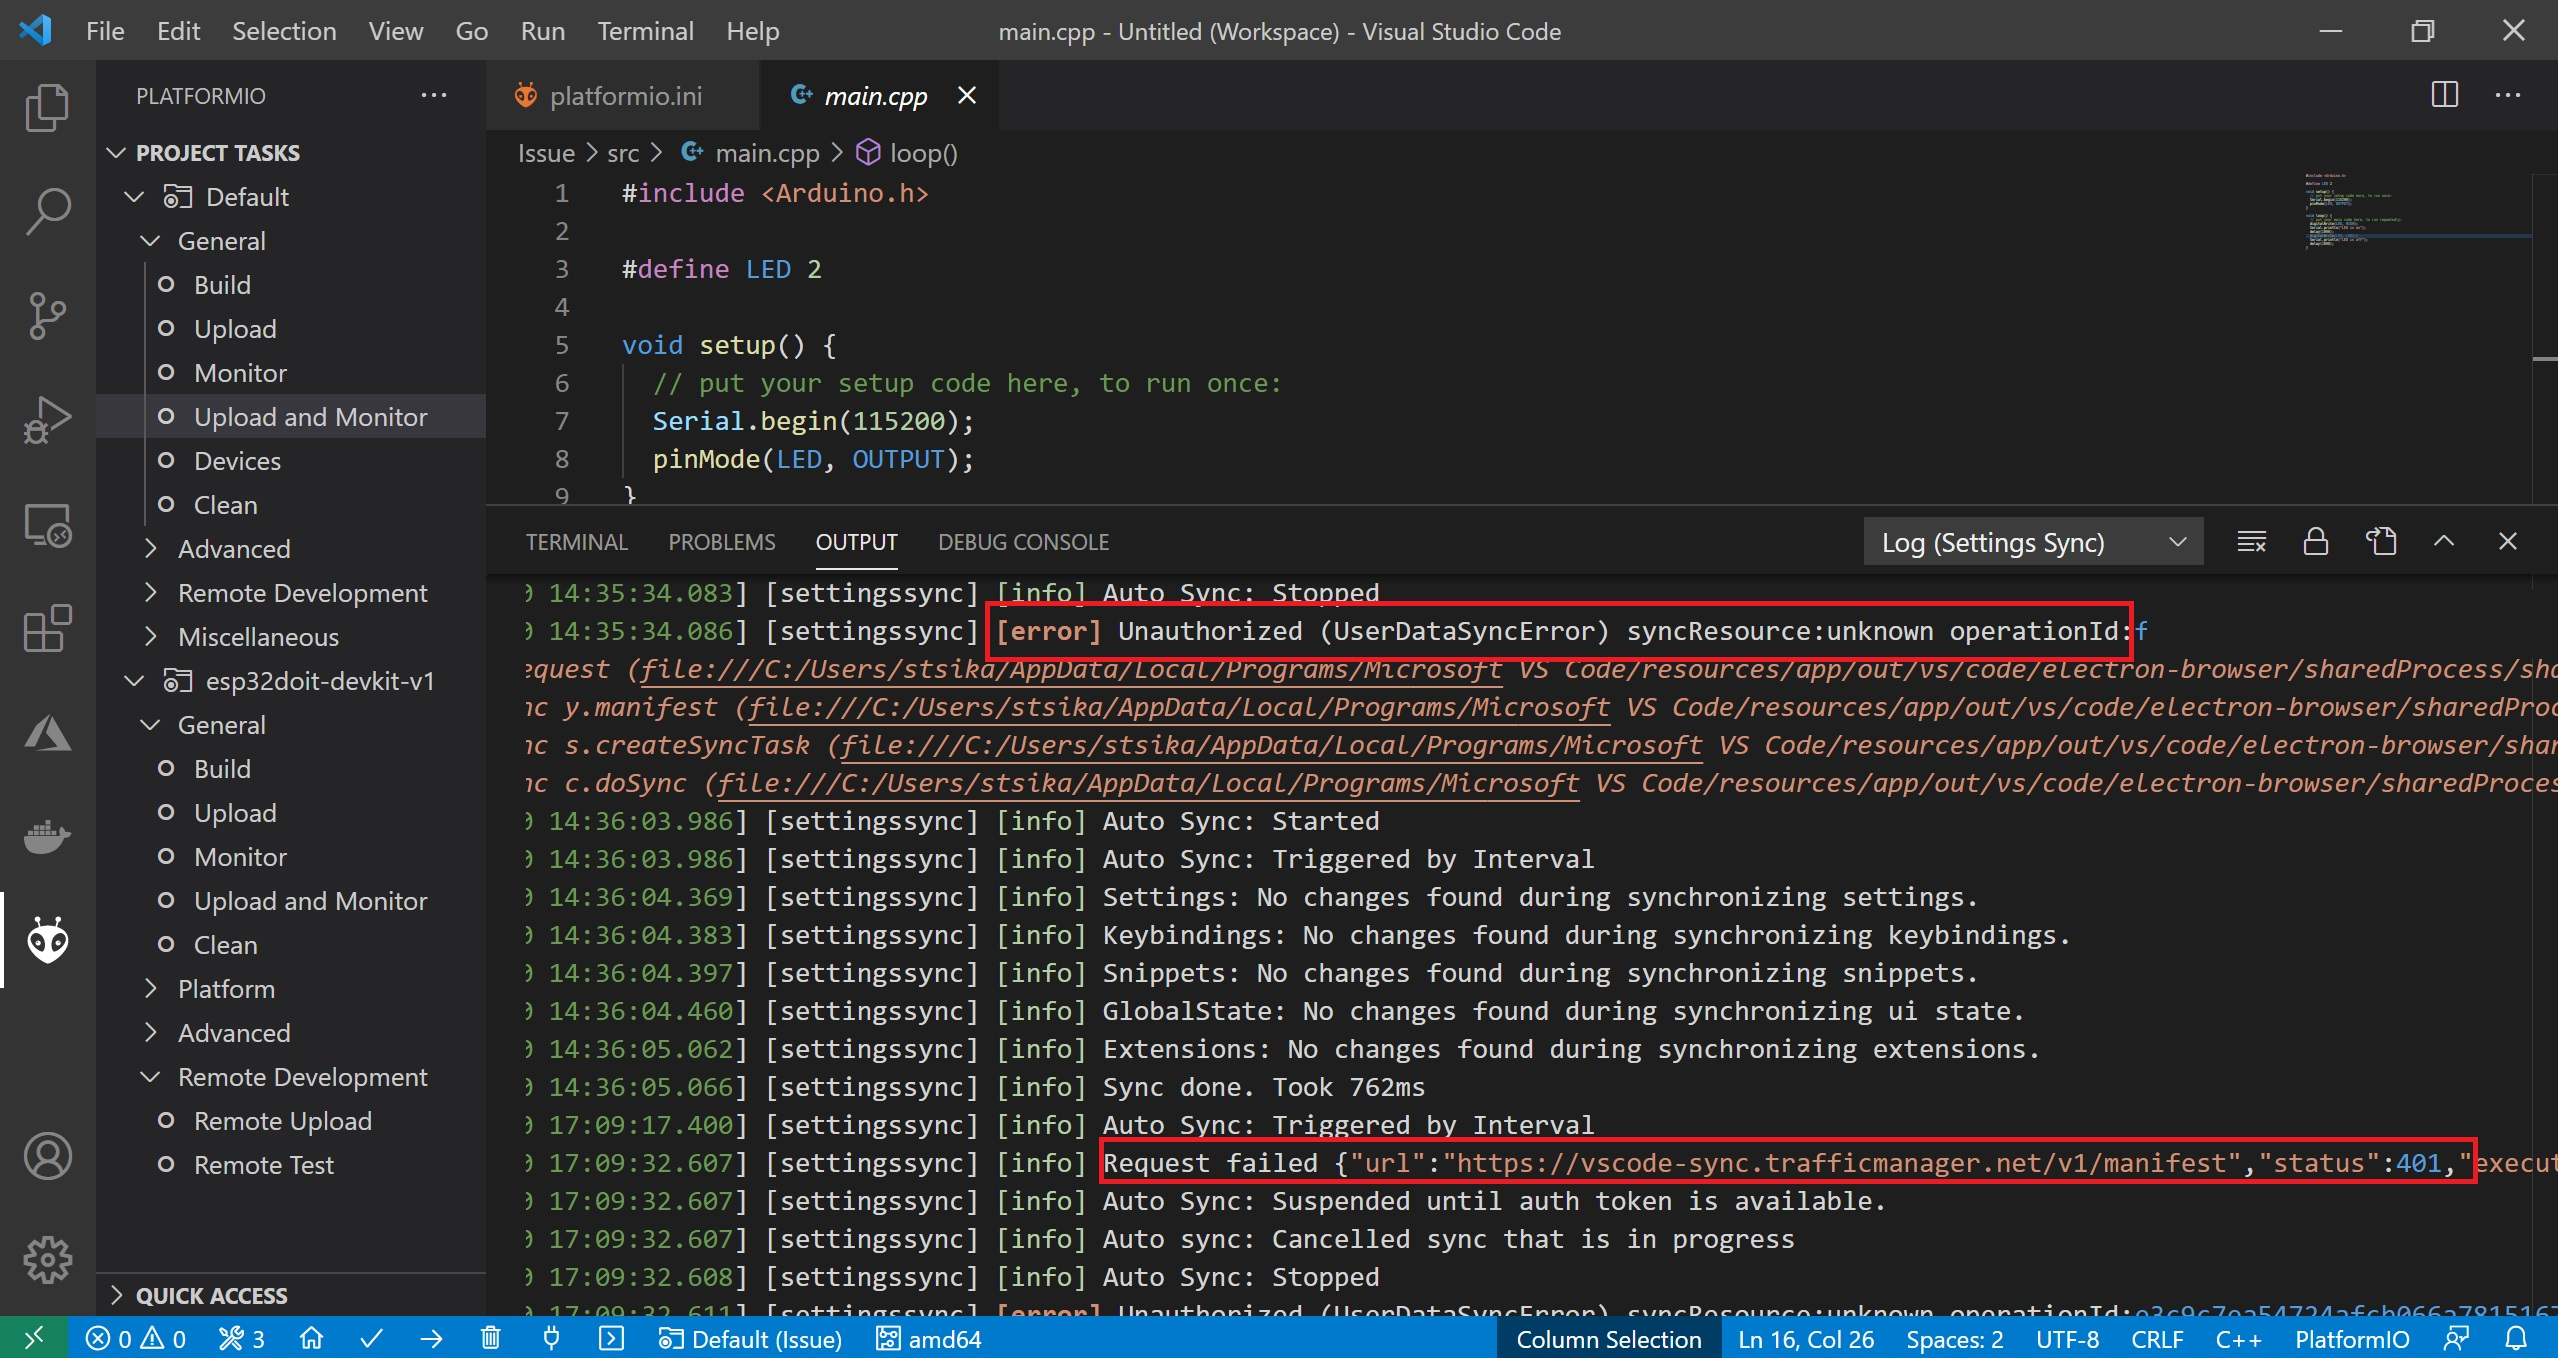 platformio VS code issue 1.4